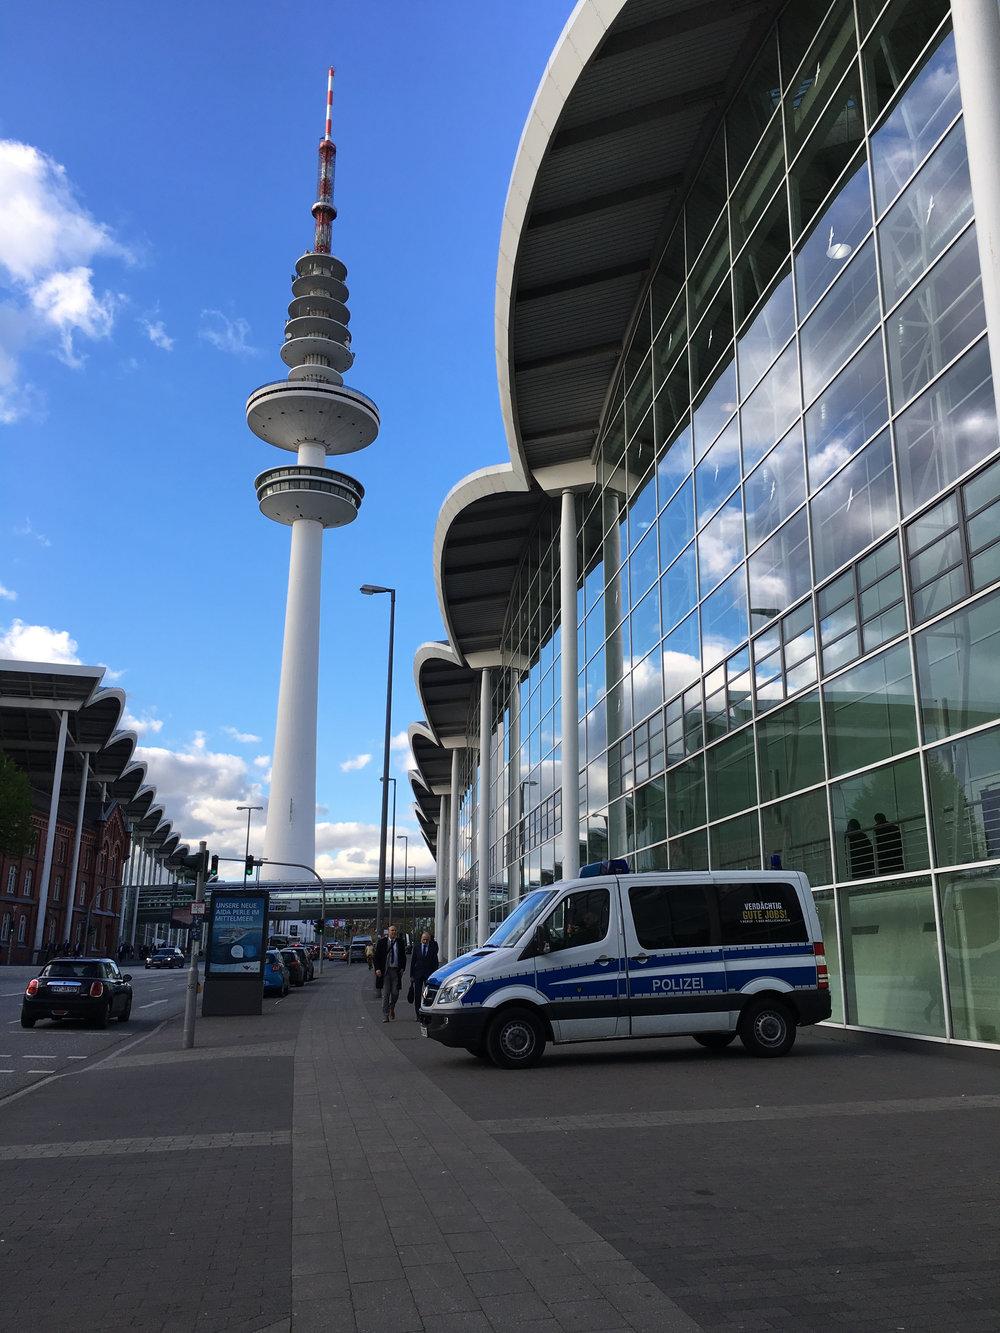 Fespa Hamburg reel